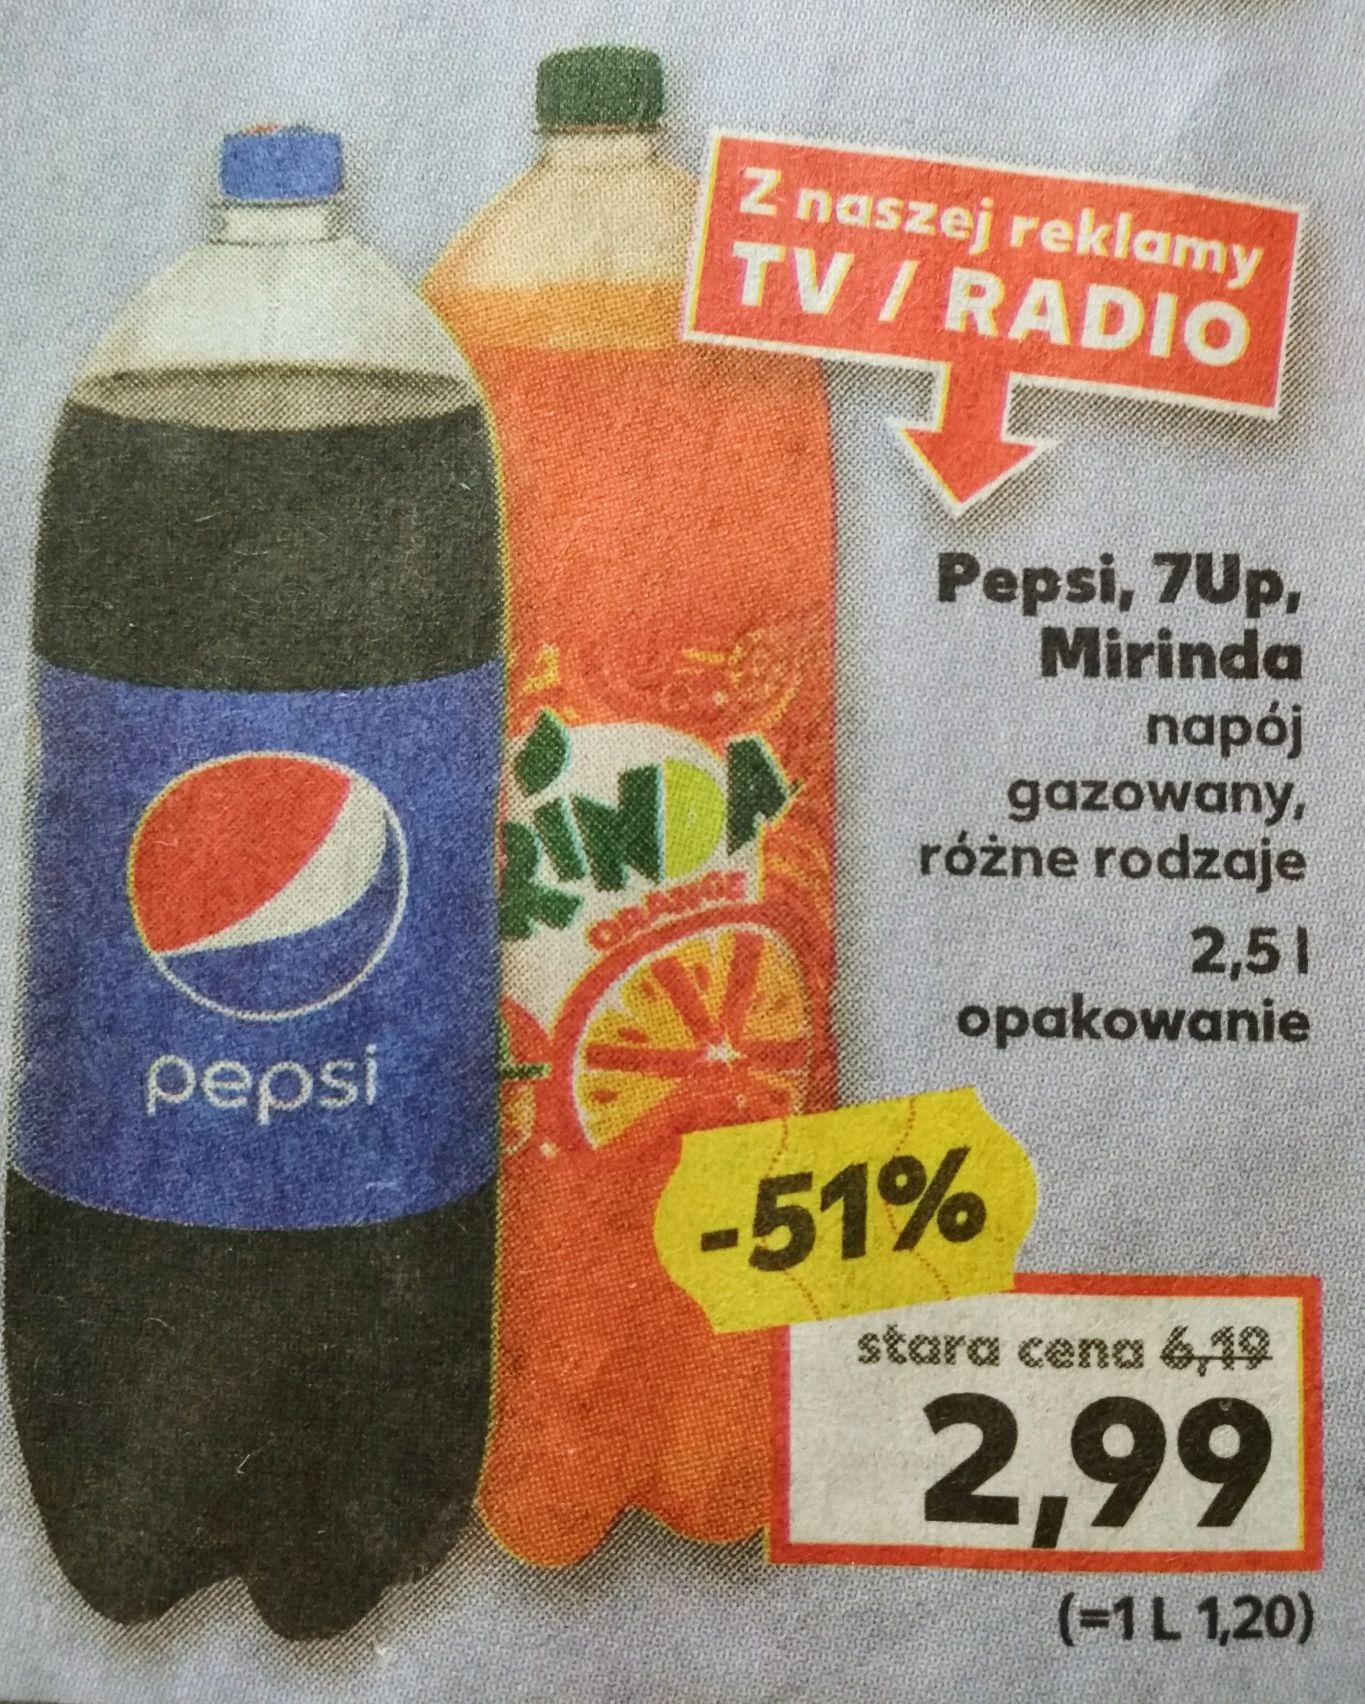 Pepsi, Mirinda, 7up - 2,5L - 2,99pln - Kaufland